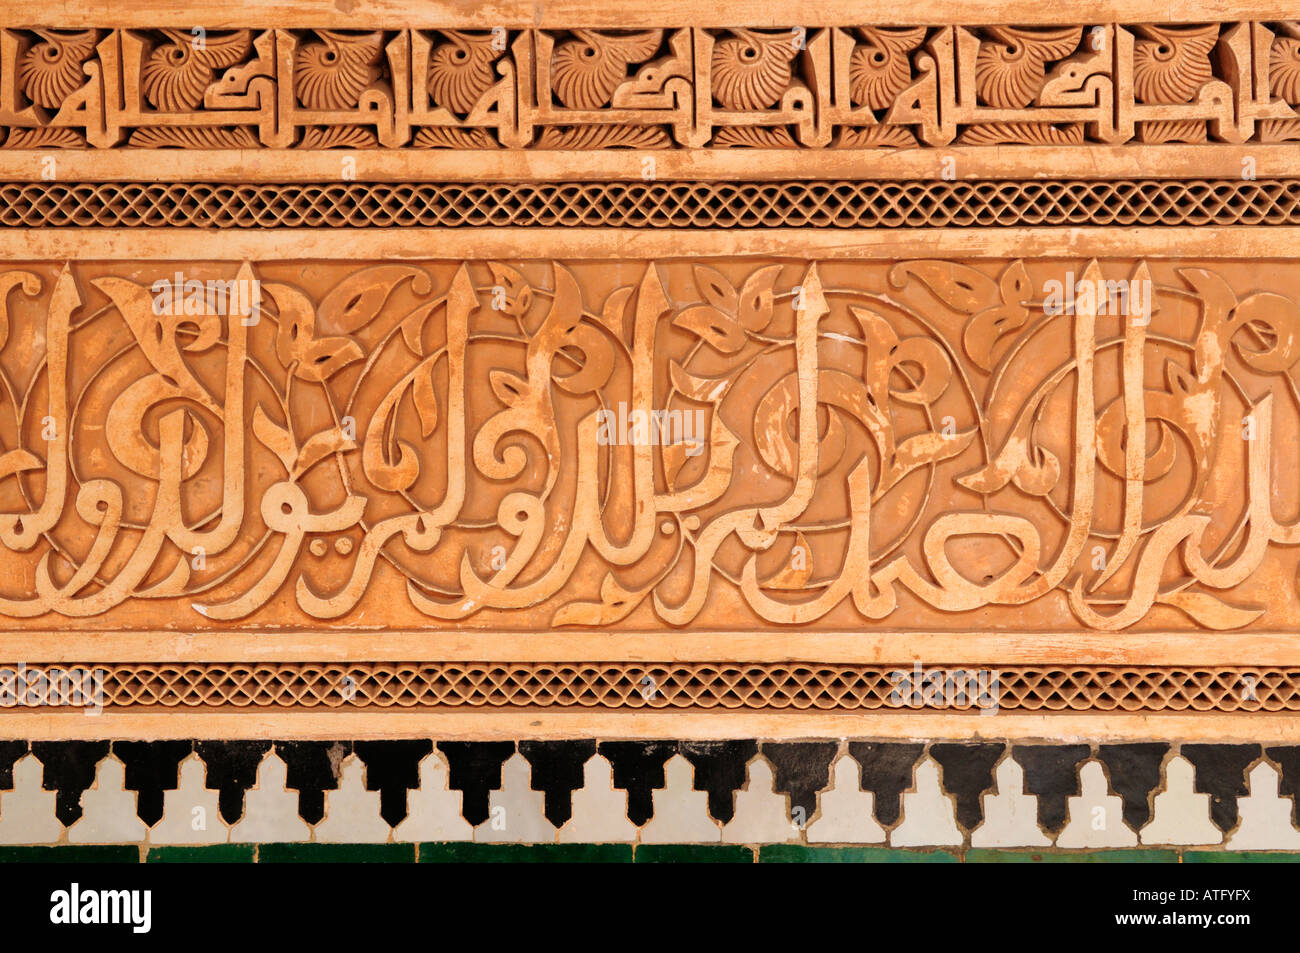 tiles marrakech stockfotos tiles marrakech bilder alamy. Black Bedroom Furniture Sets. Home Design Ideas